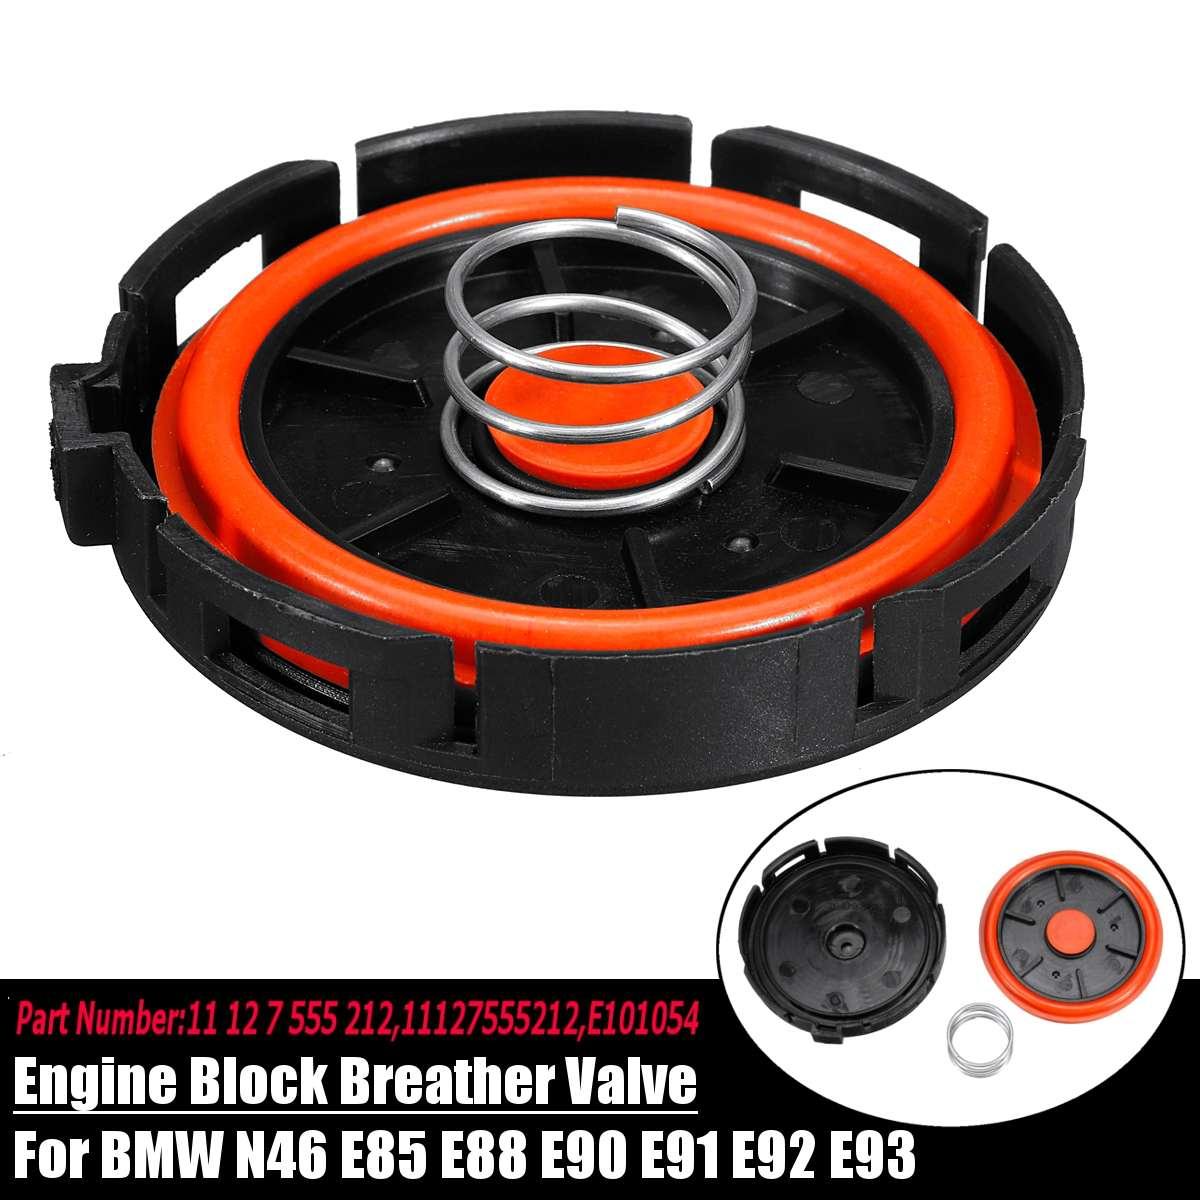 Car Accessories Engine Block Breather ValveVacuum Control 11127555212 For BMW N46 E81 E82 E84 E85 E87 E88 E90 E91 E92 E93